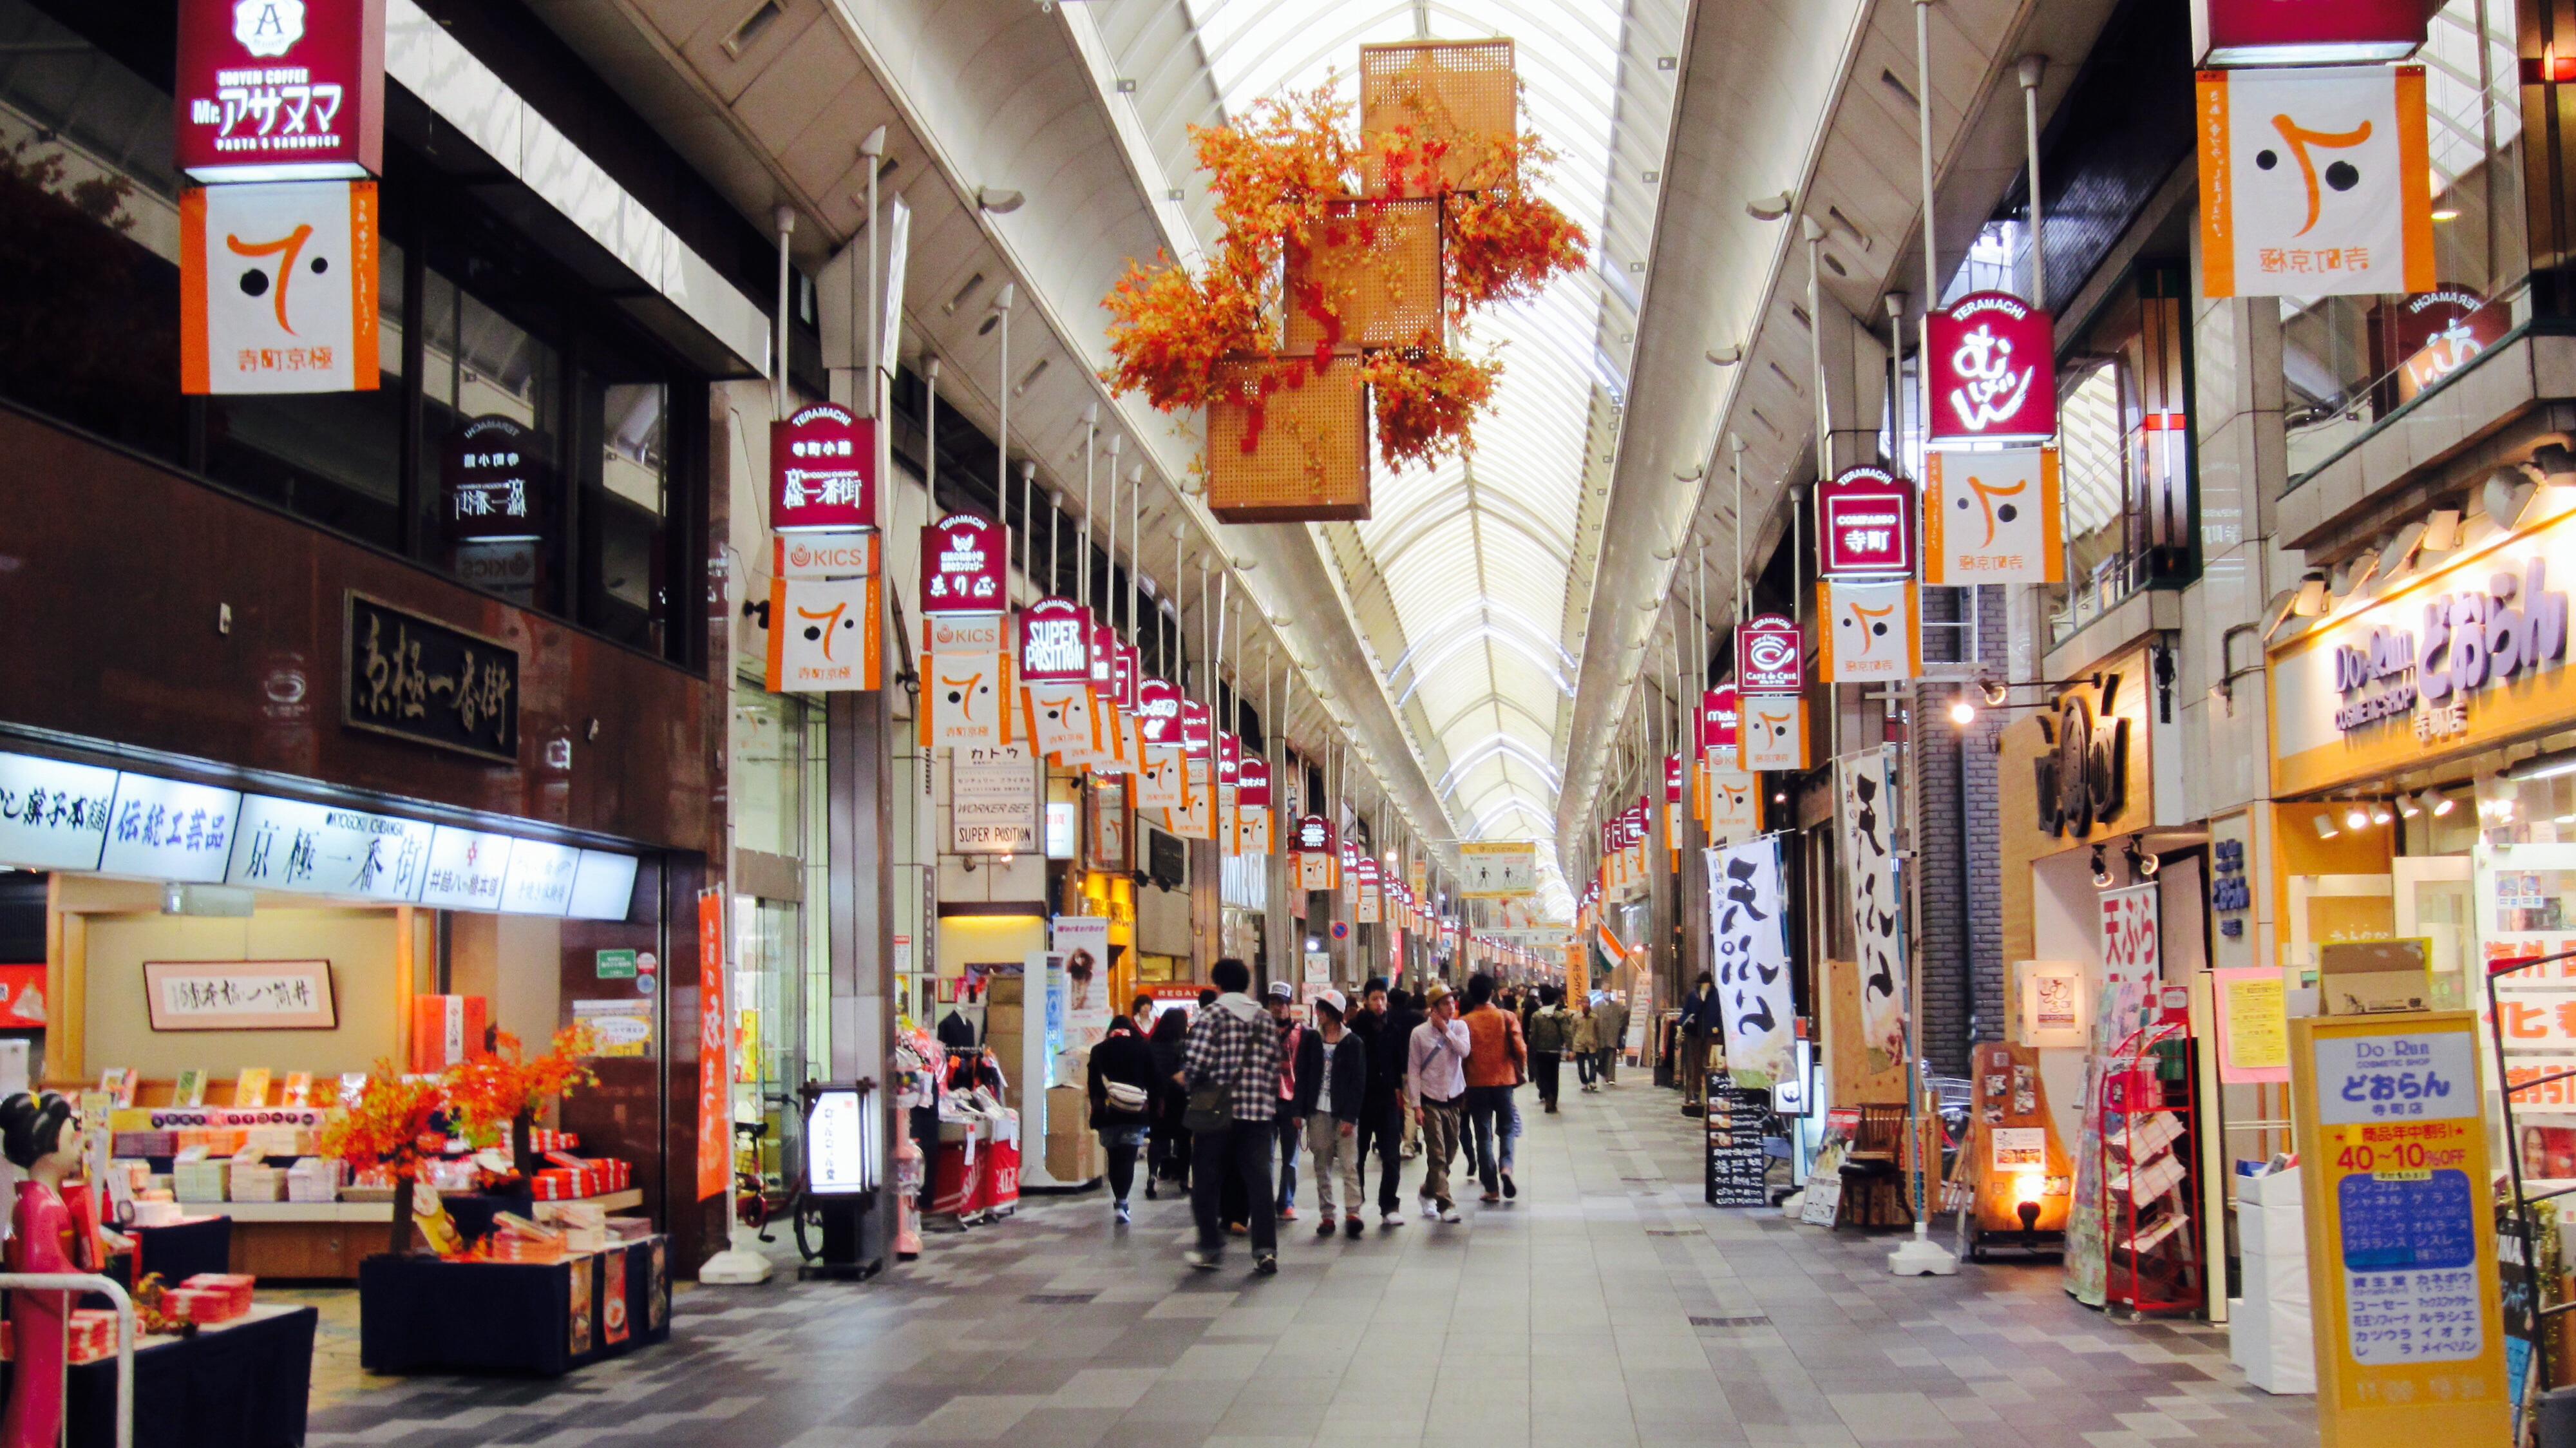 High End Japanese Street Food